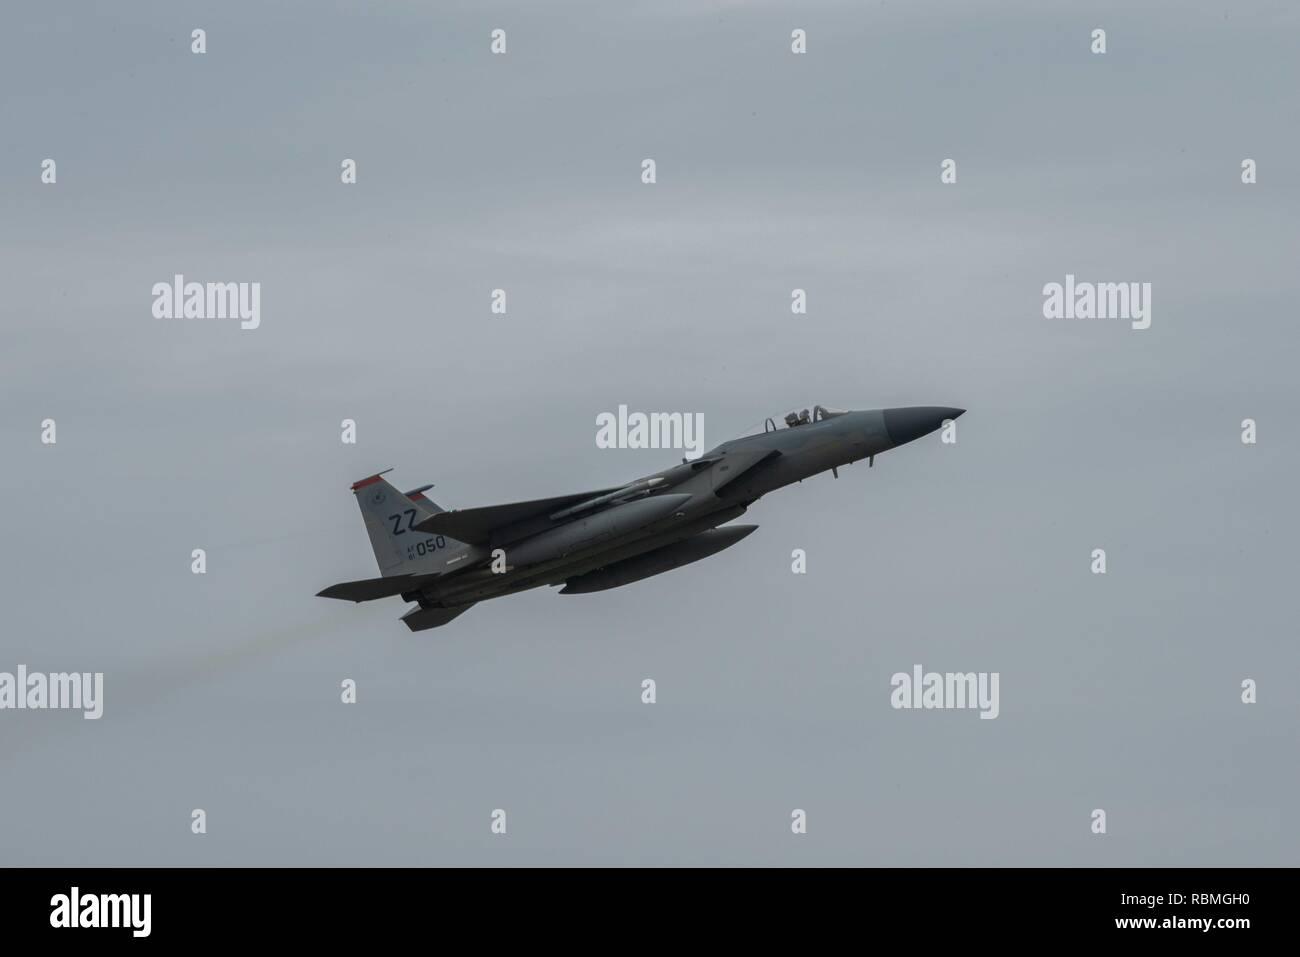 A U S  Air Force F-15 Eagle takes off on the flightline, Jan  9